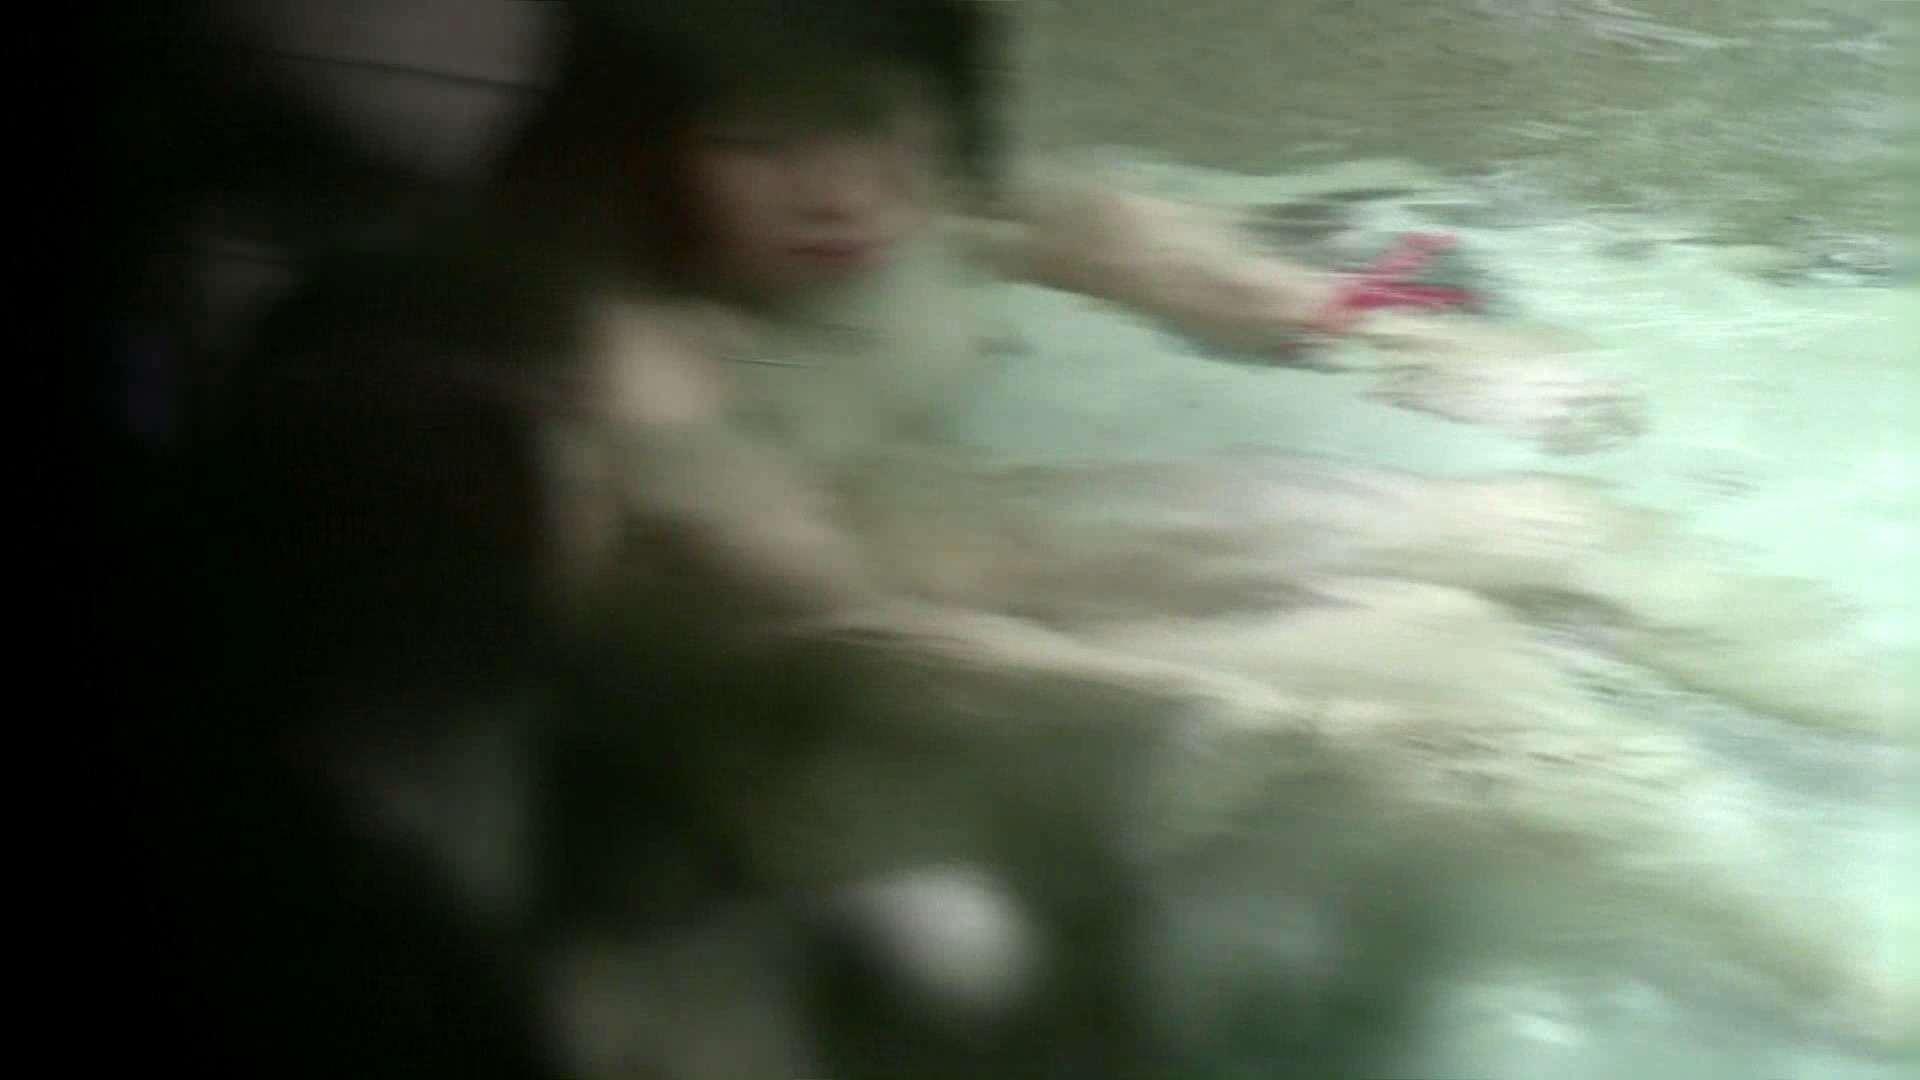 Aquaな露天風呂Vol.655 美しいOLの裸体 | 露天風呂突入  72pic 31